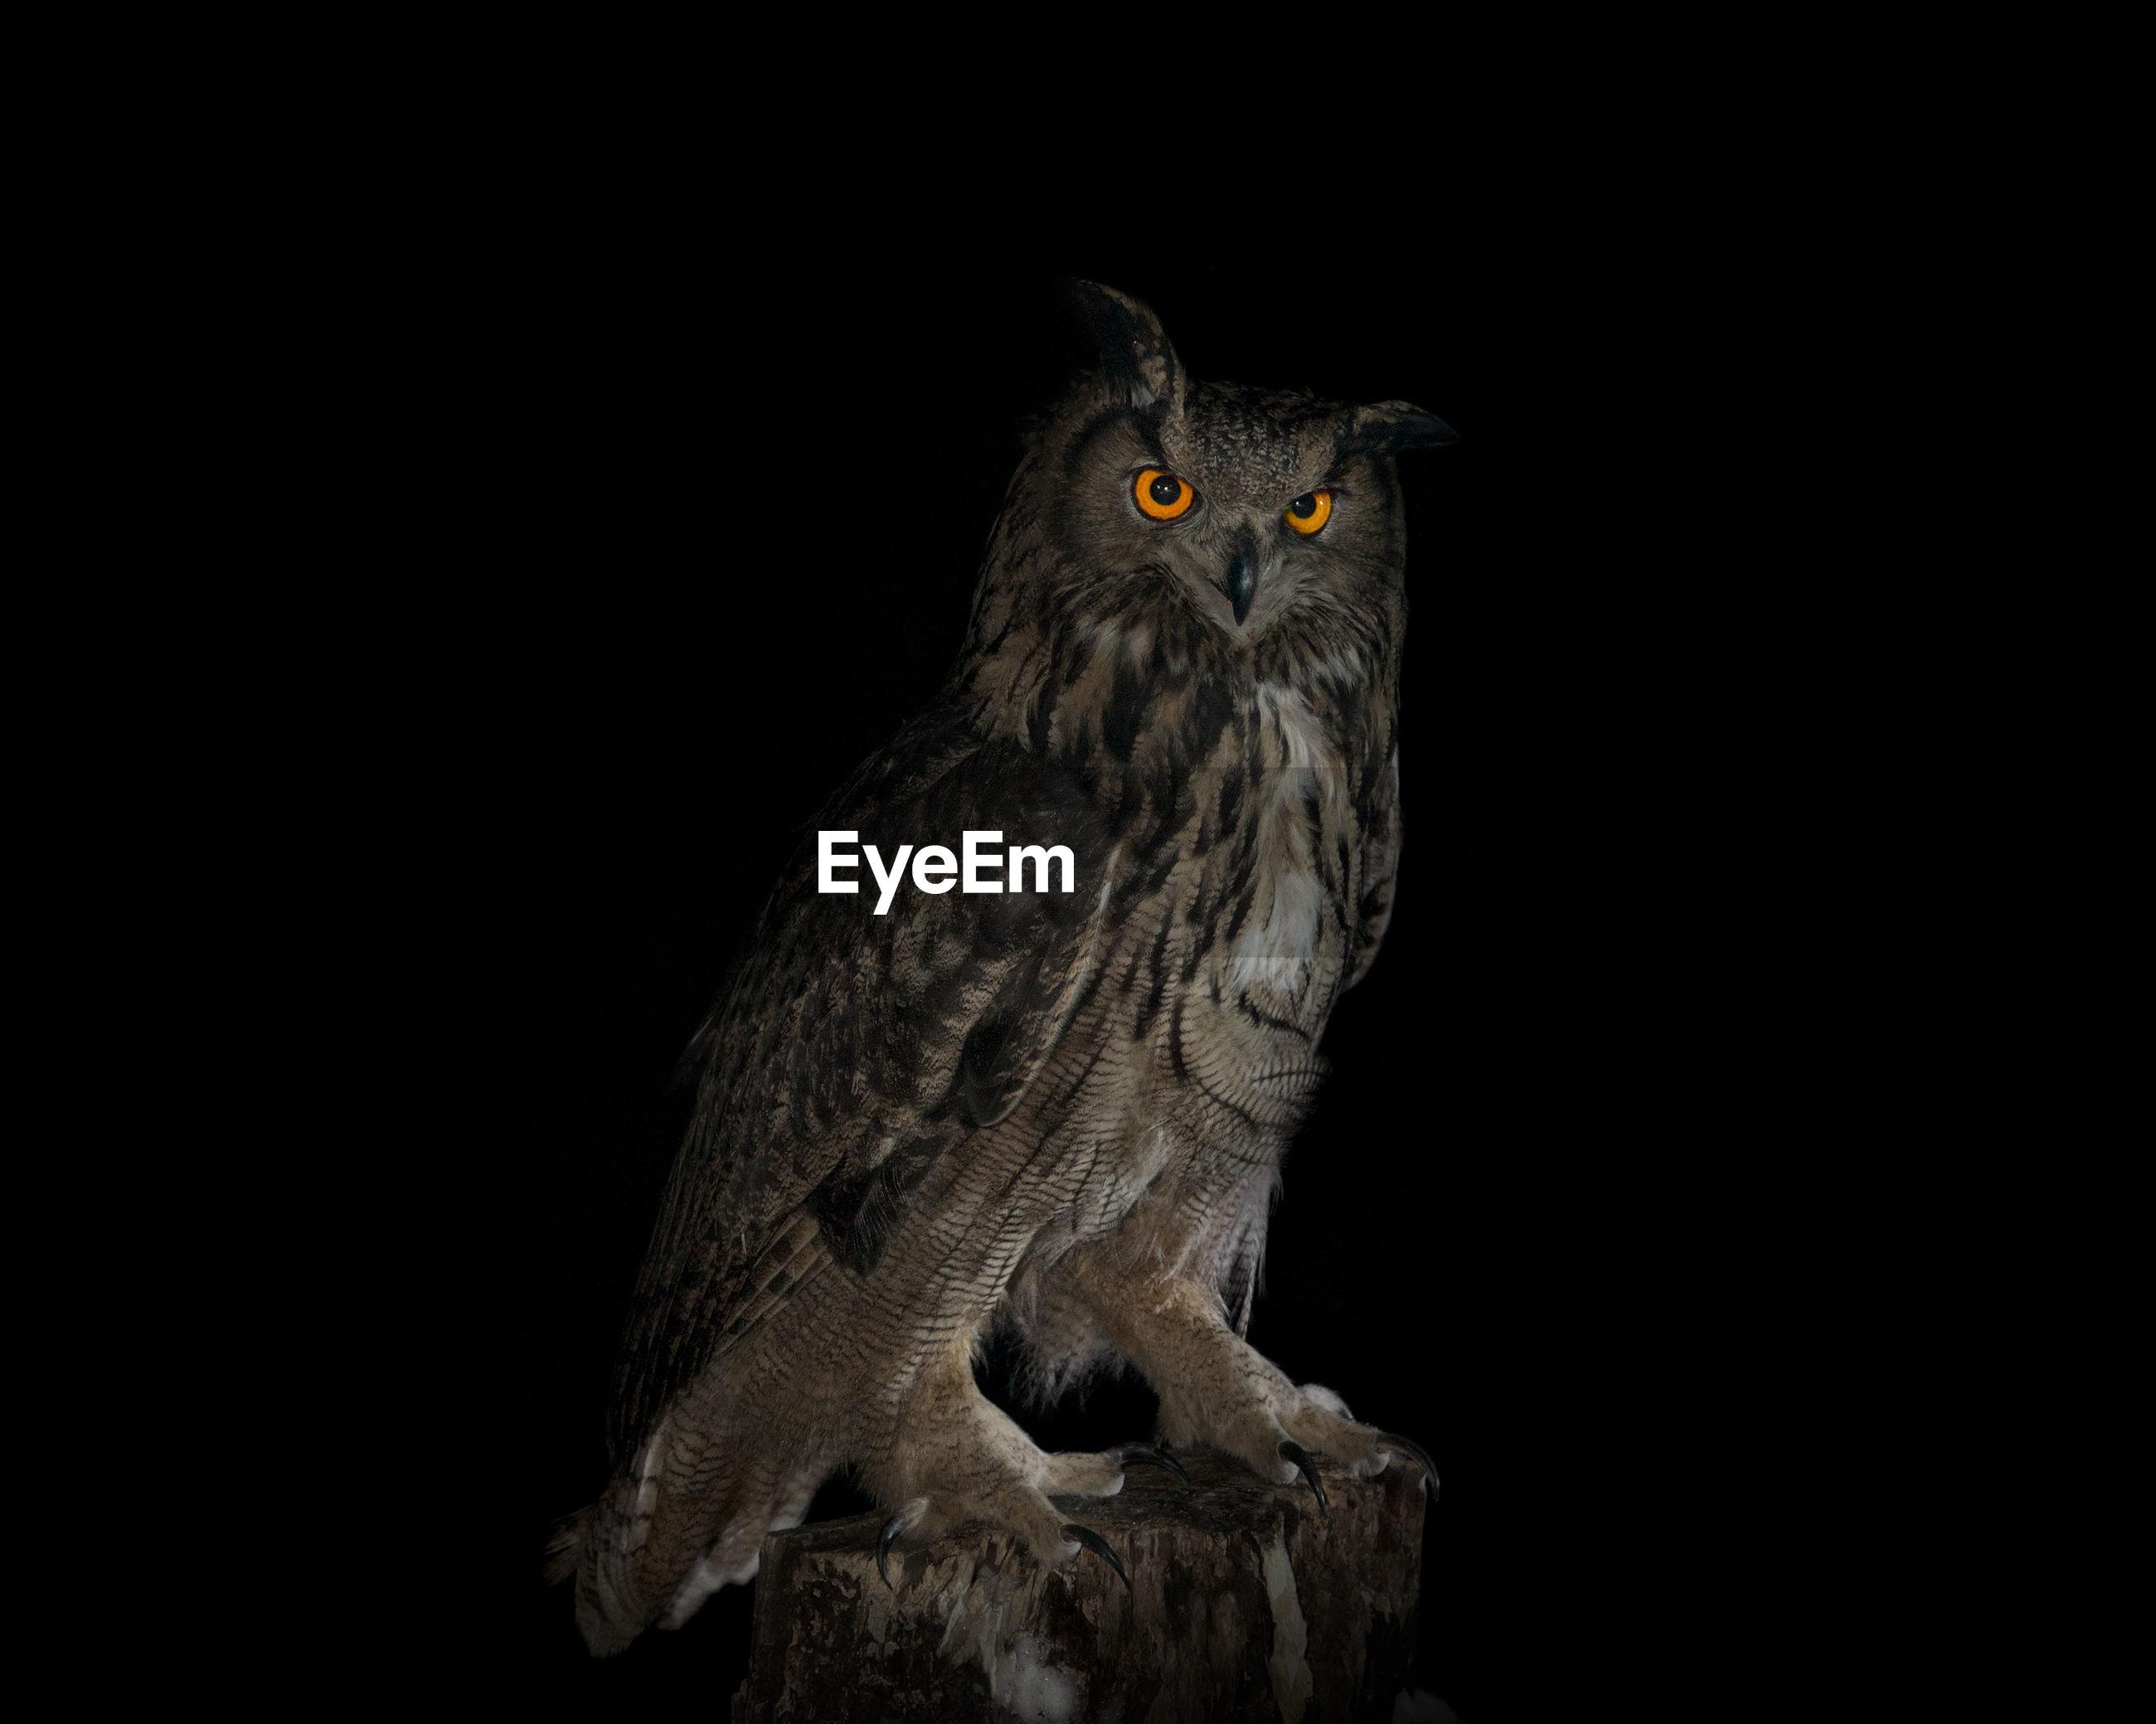 Portrait of eagle owl on wood at night